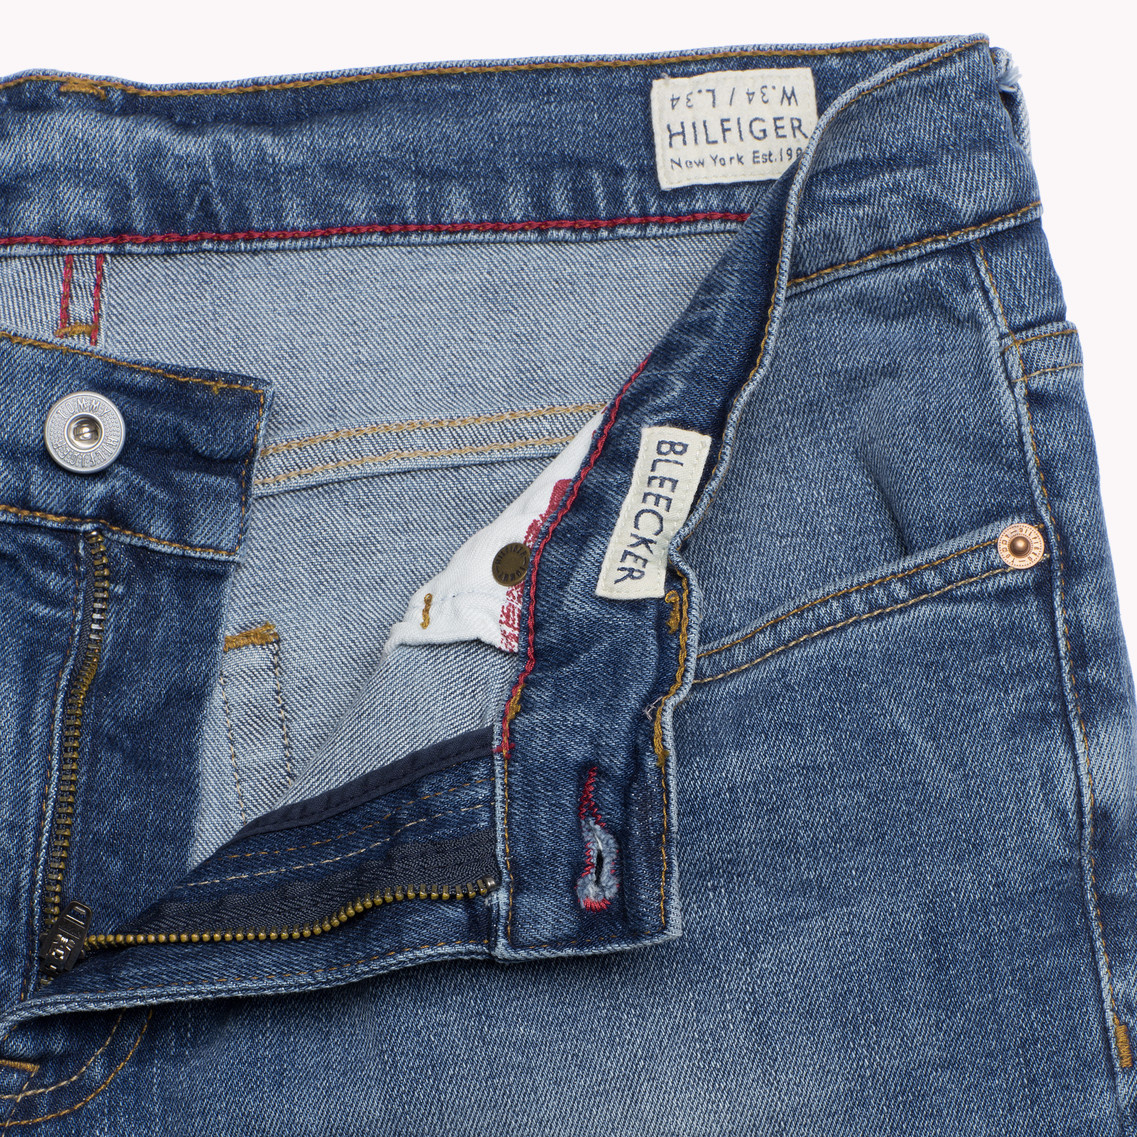 bfa24c07 Tommy Hilfiger Bleecker Slim Fit Jeans in Blue for Men - Lyst